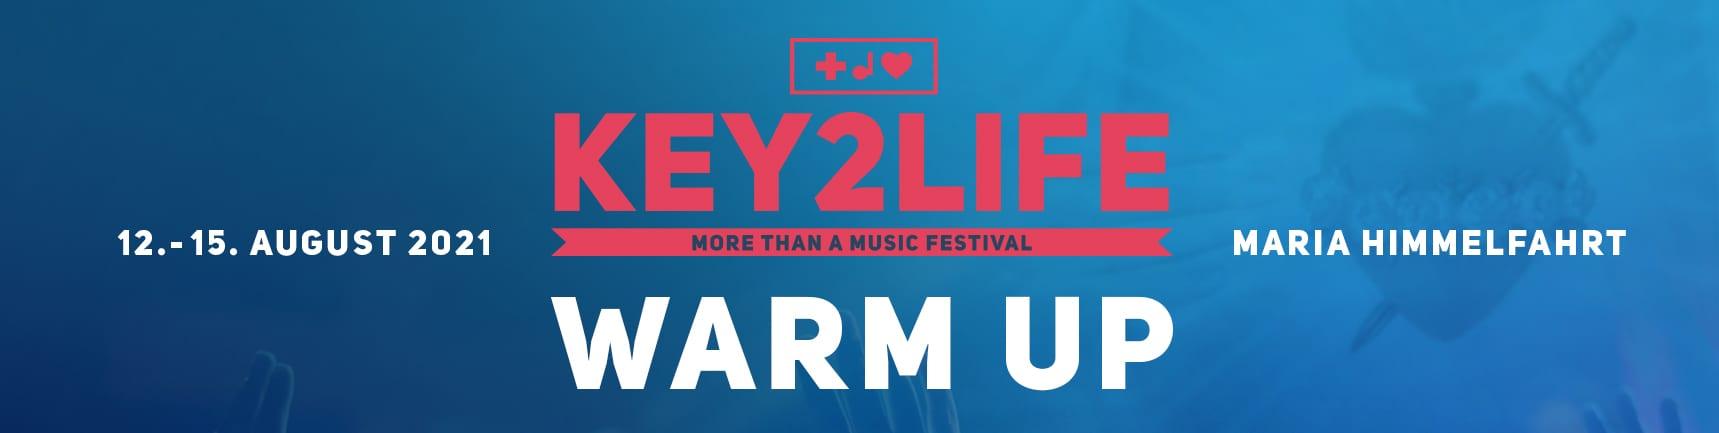 Key2life warm up